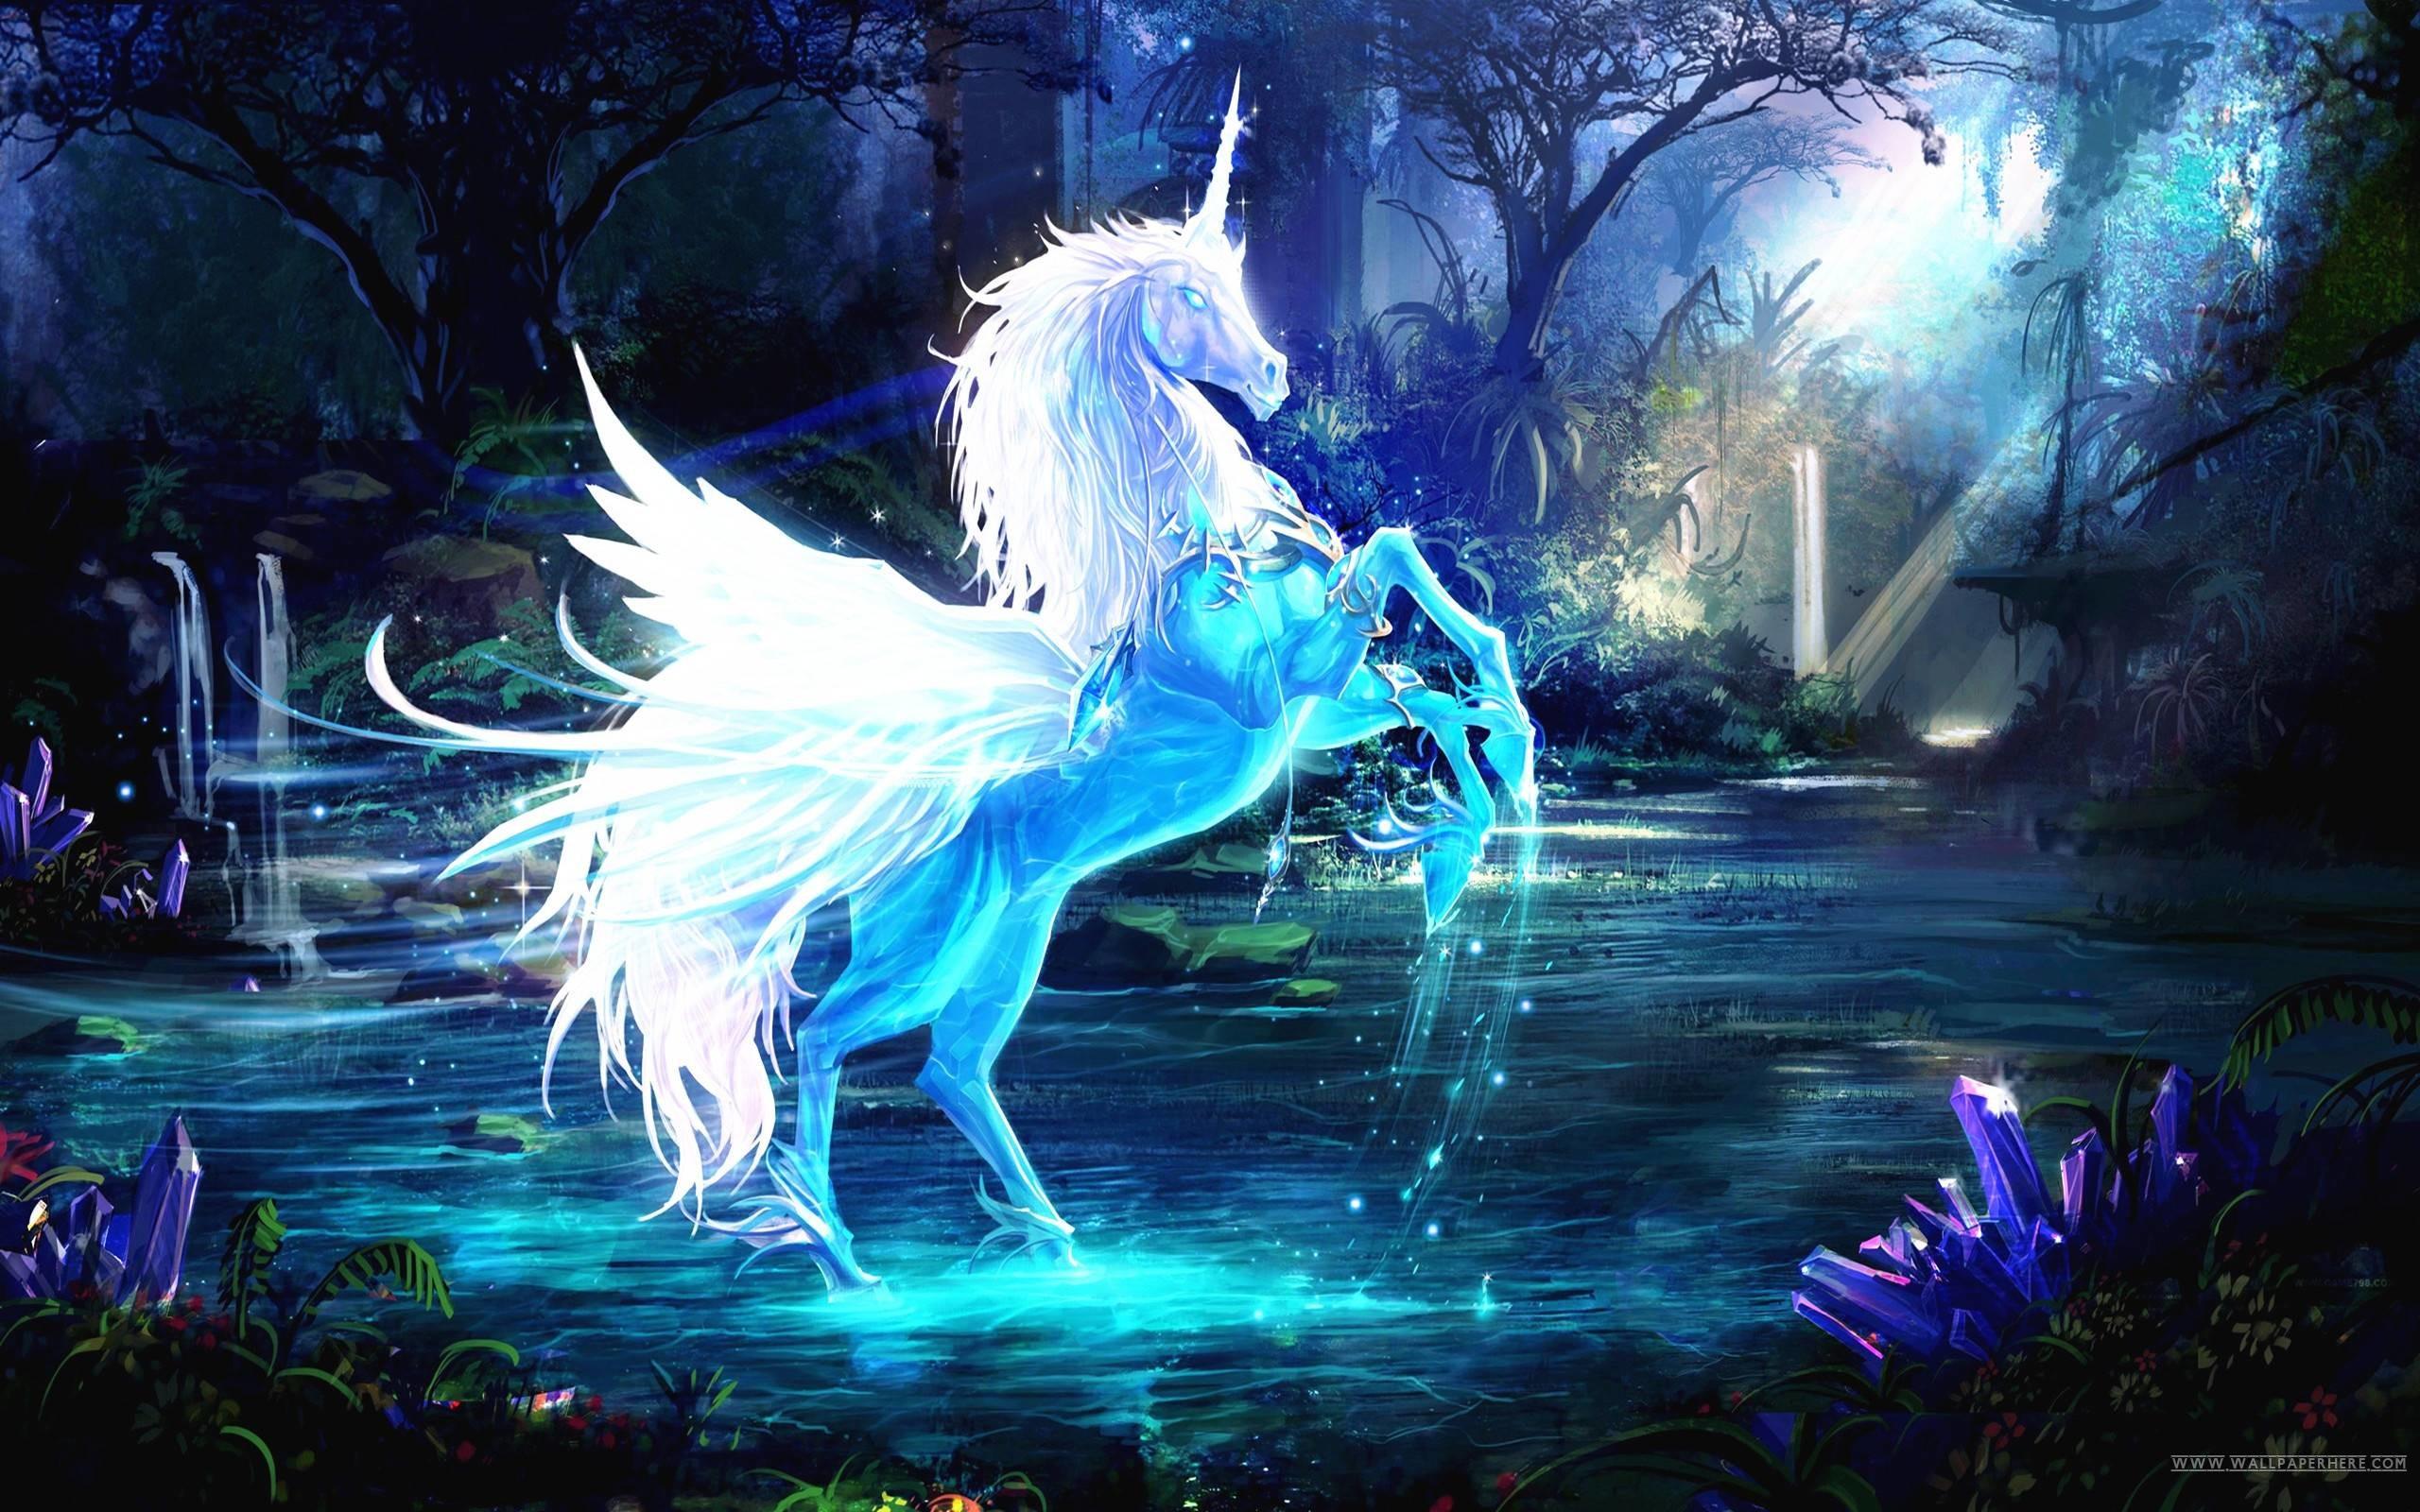 <b>Unicorn Screensavers</b> and <b>Wallpaper</